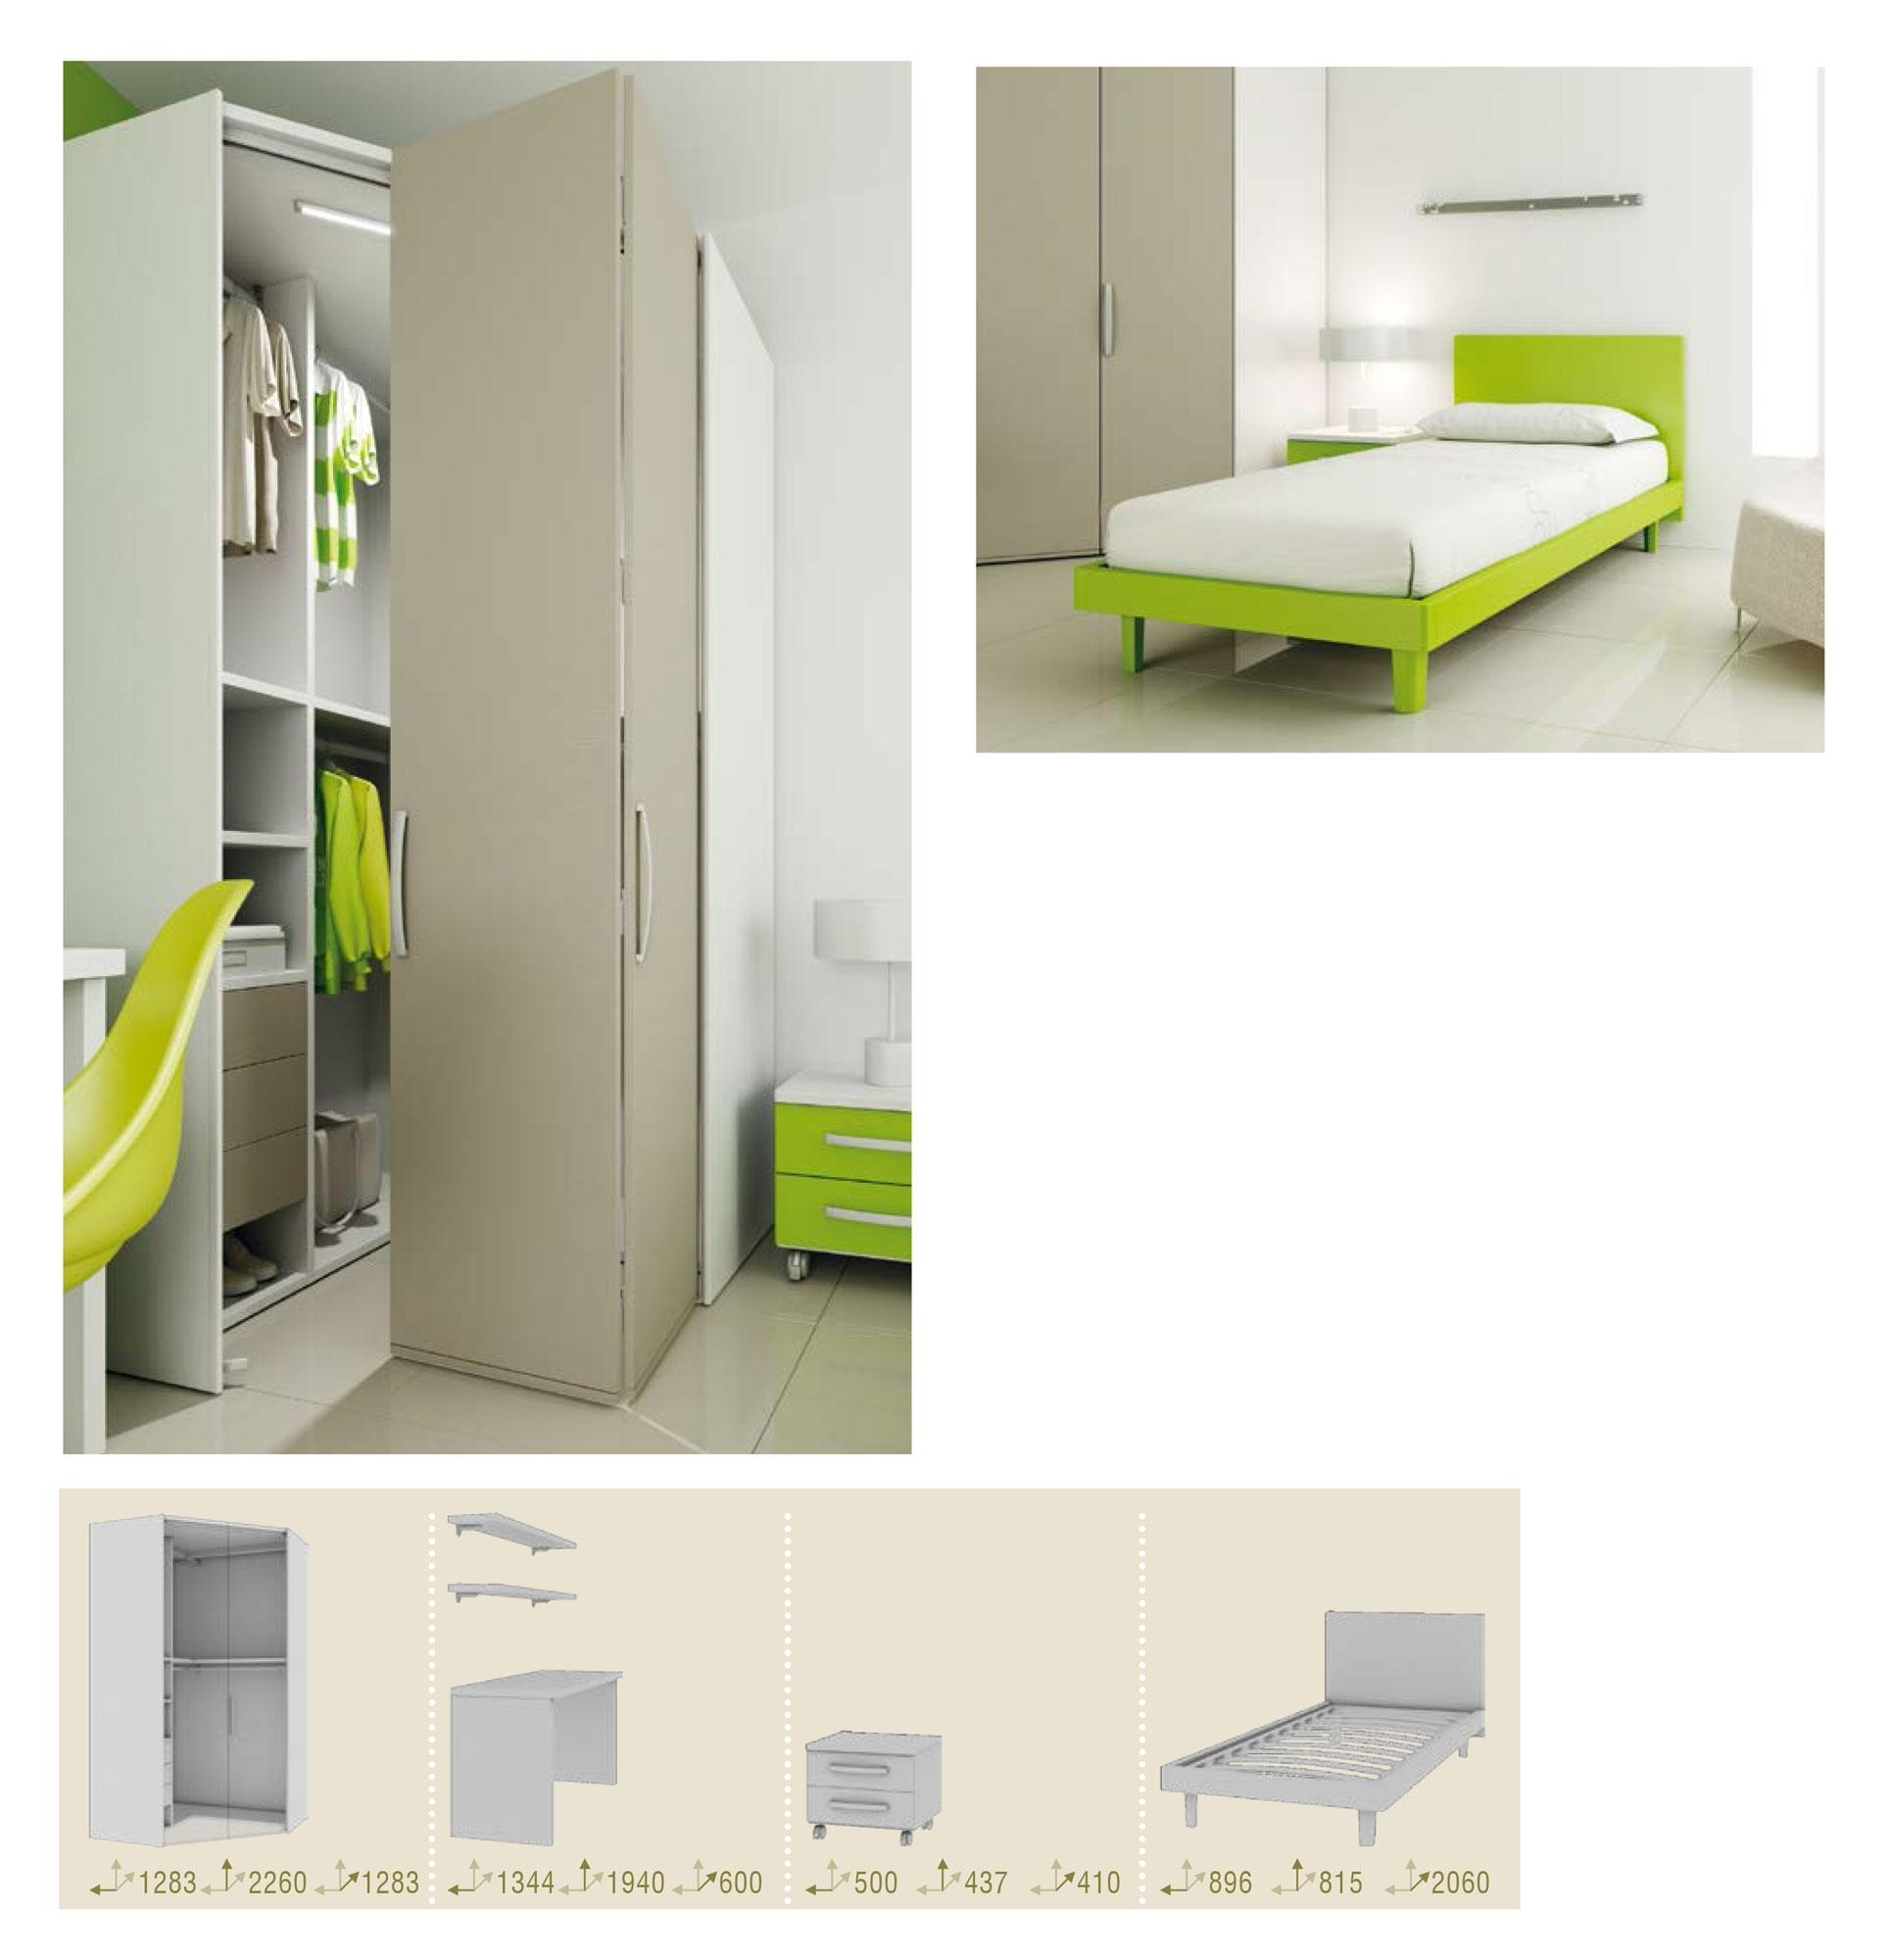 lit 1 personne ensemble tr s moderne fun moretti compact so nuit. Black Bedroom Furniture Sets. Home Design Ideas